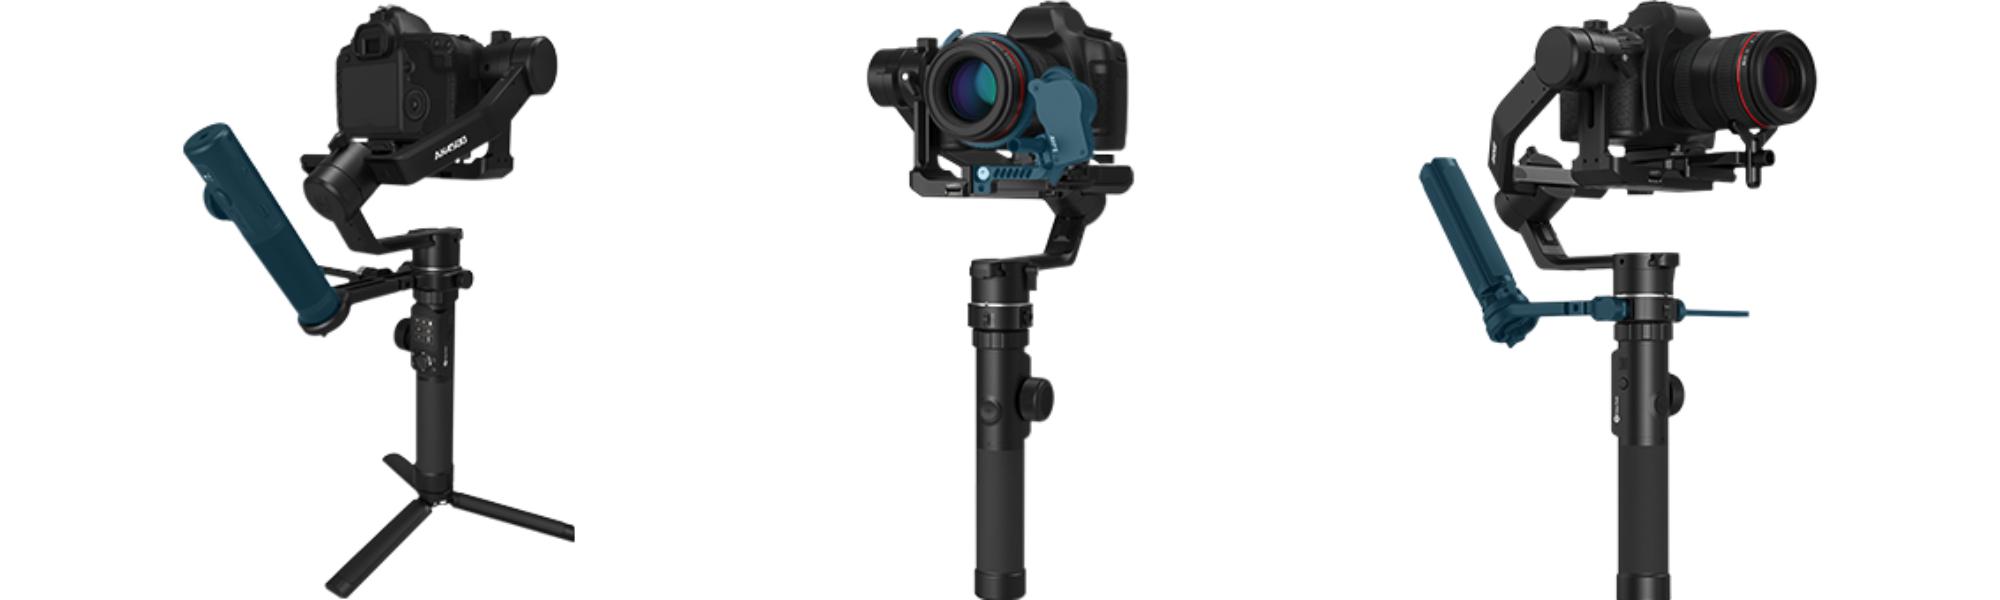 Grafika - Gimbal ręczny FeiyuTech AK4500 Standard Kit do aparatółw VDSLR i kamer_09.jpg